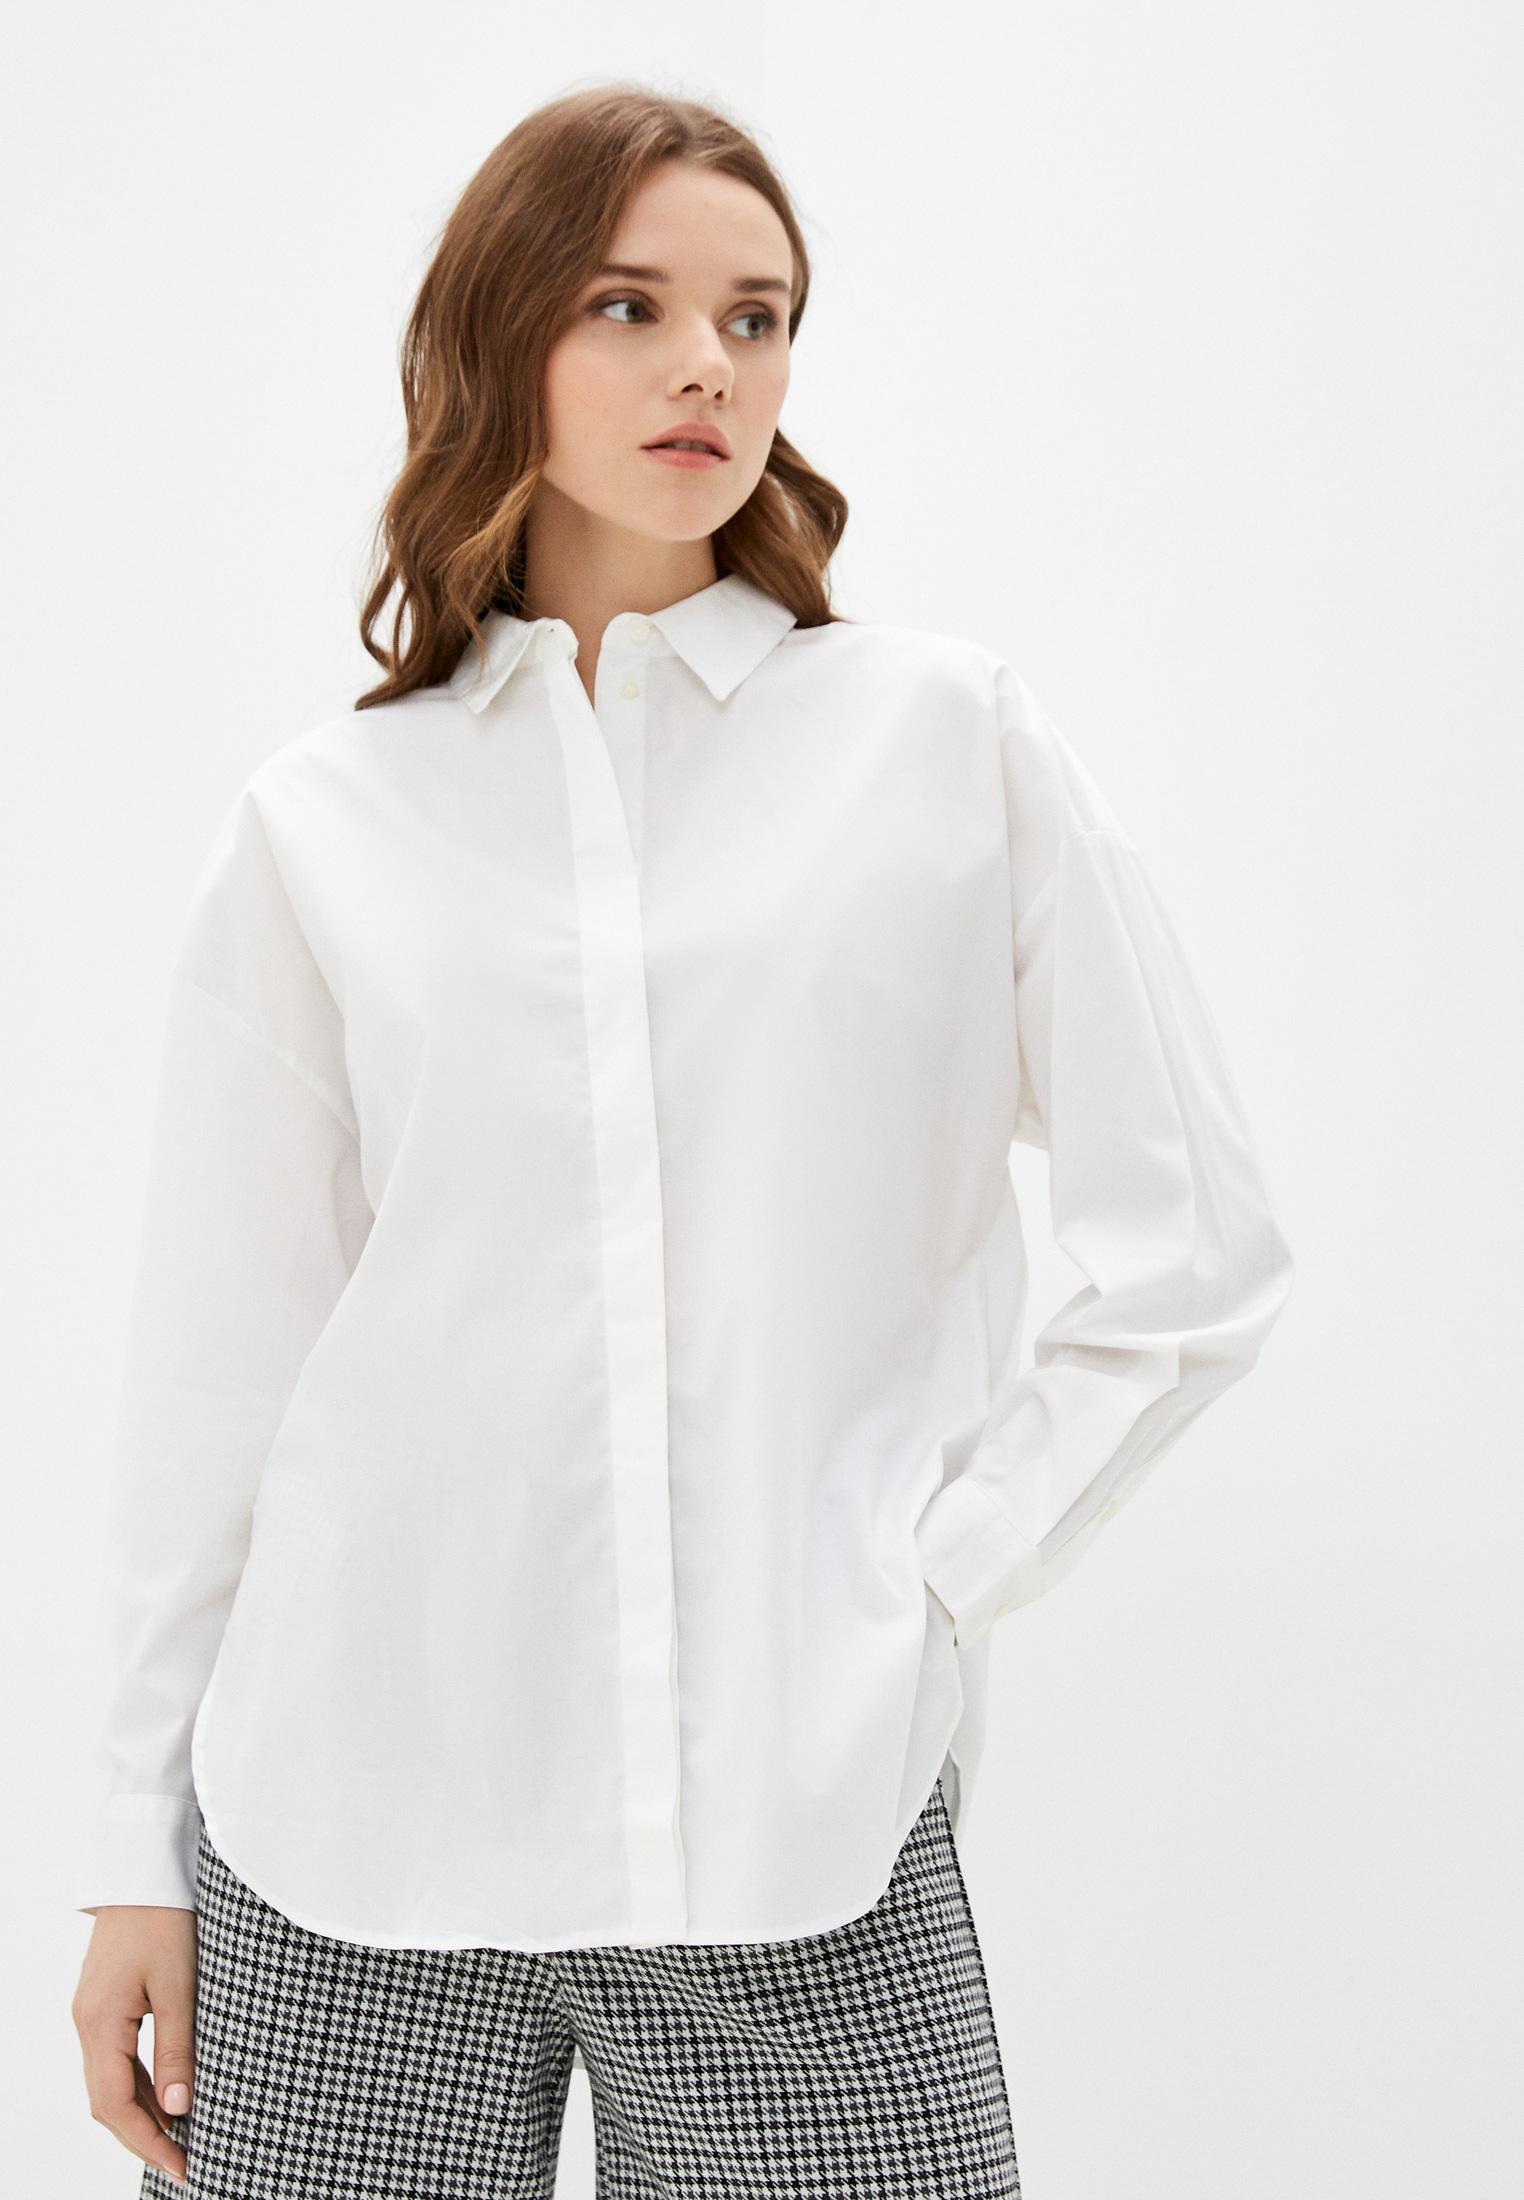 Женские рубашки с длинным рукавом Only (Онли) Рубашка Only